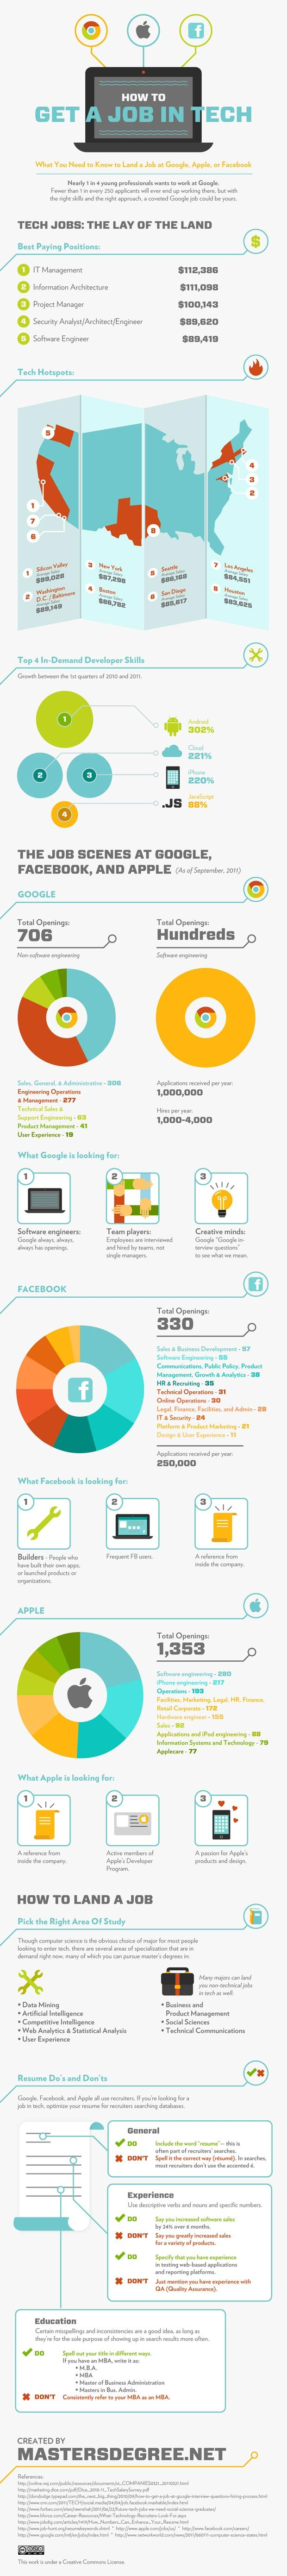 Infographics How To Get A New Job In Tech Tech Infographic Tech Job Technology Job